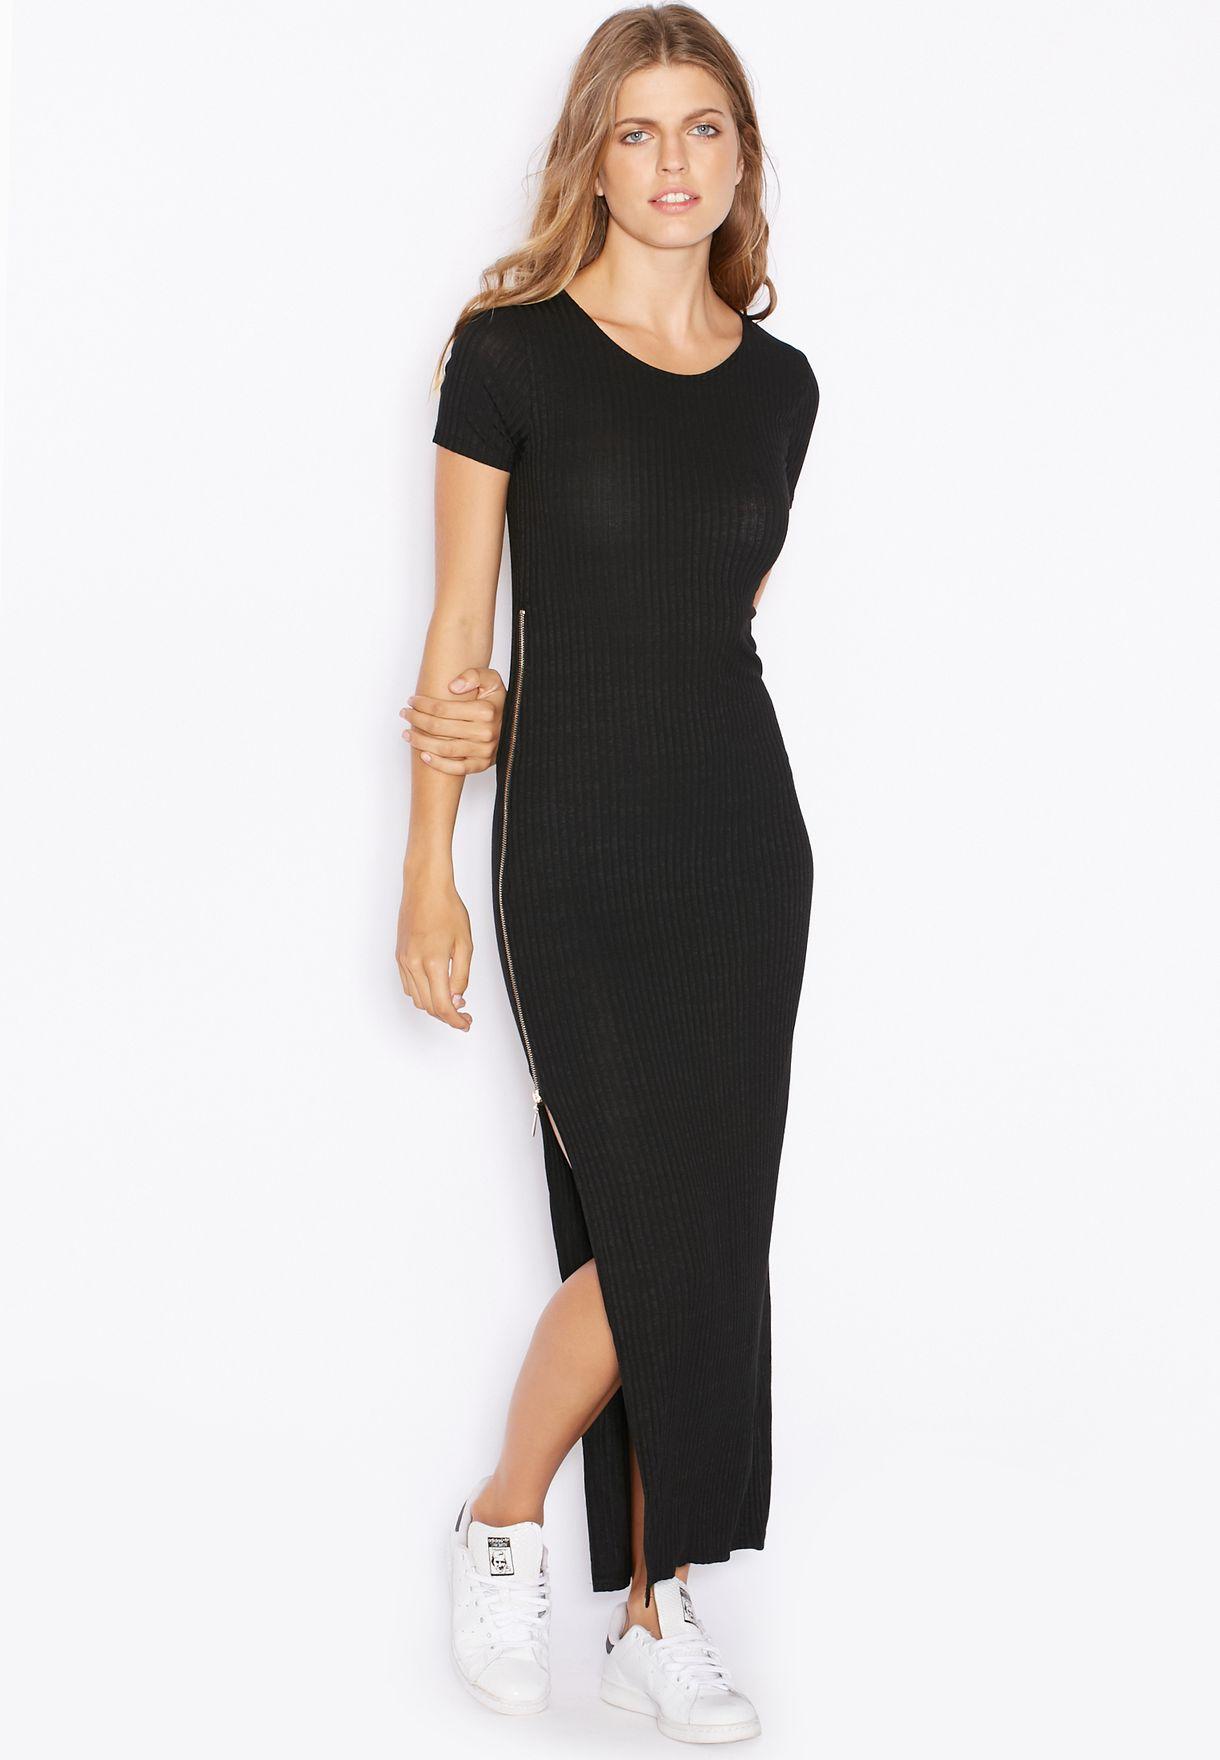 04c0ec9b349 Shop Ginger Basics black Ribbed Side Zip Maxi Dress for Women in ...